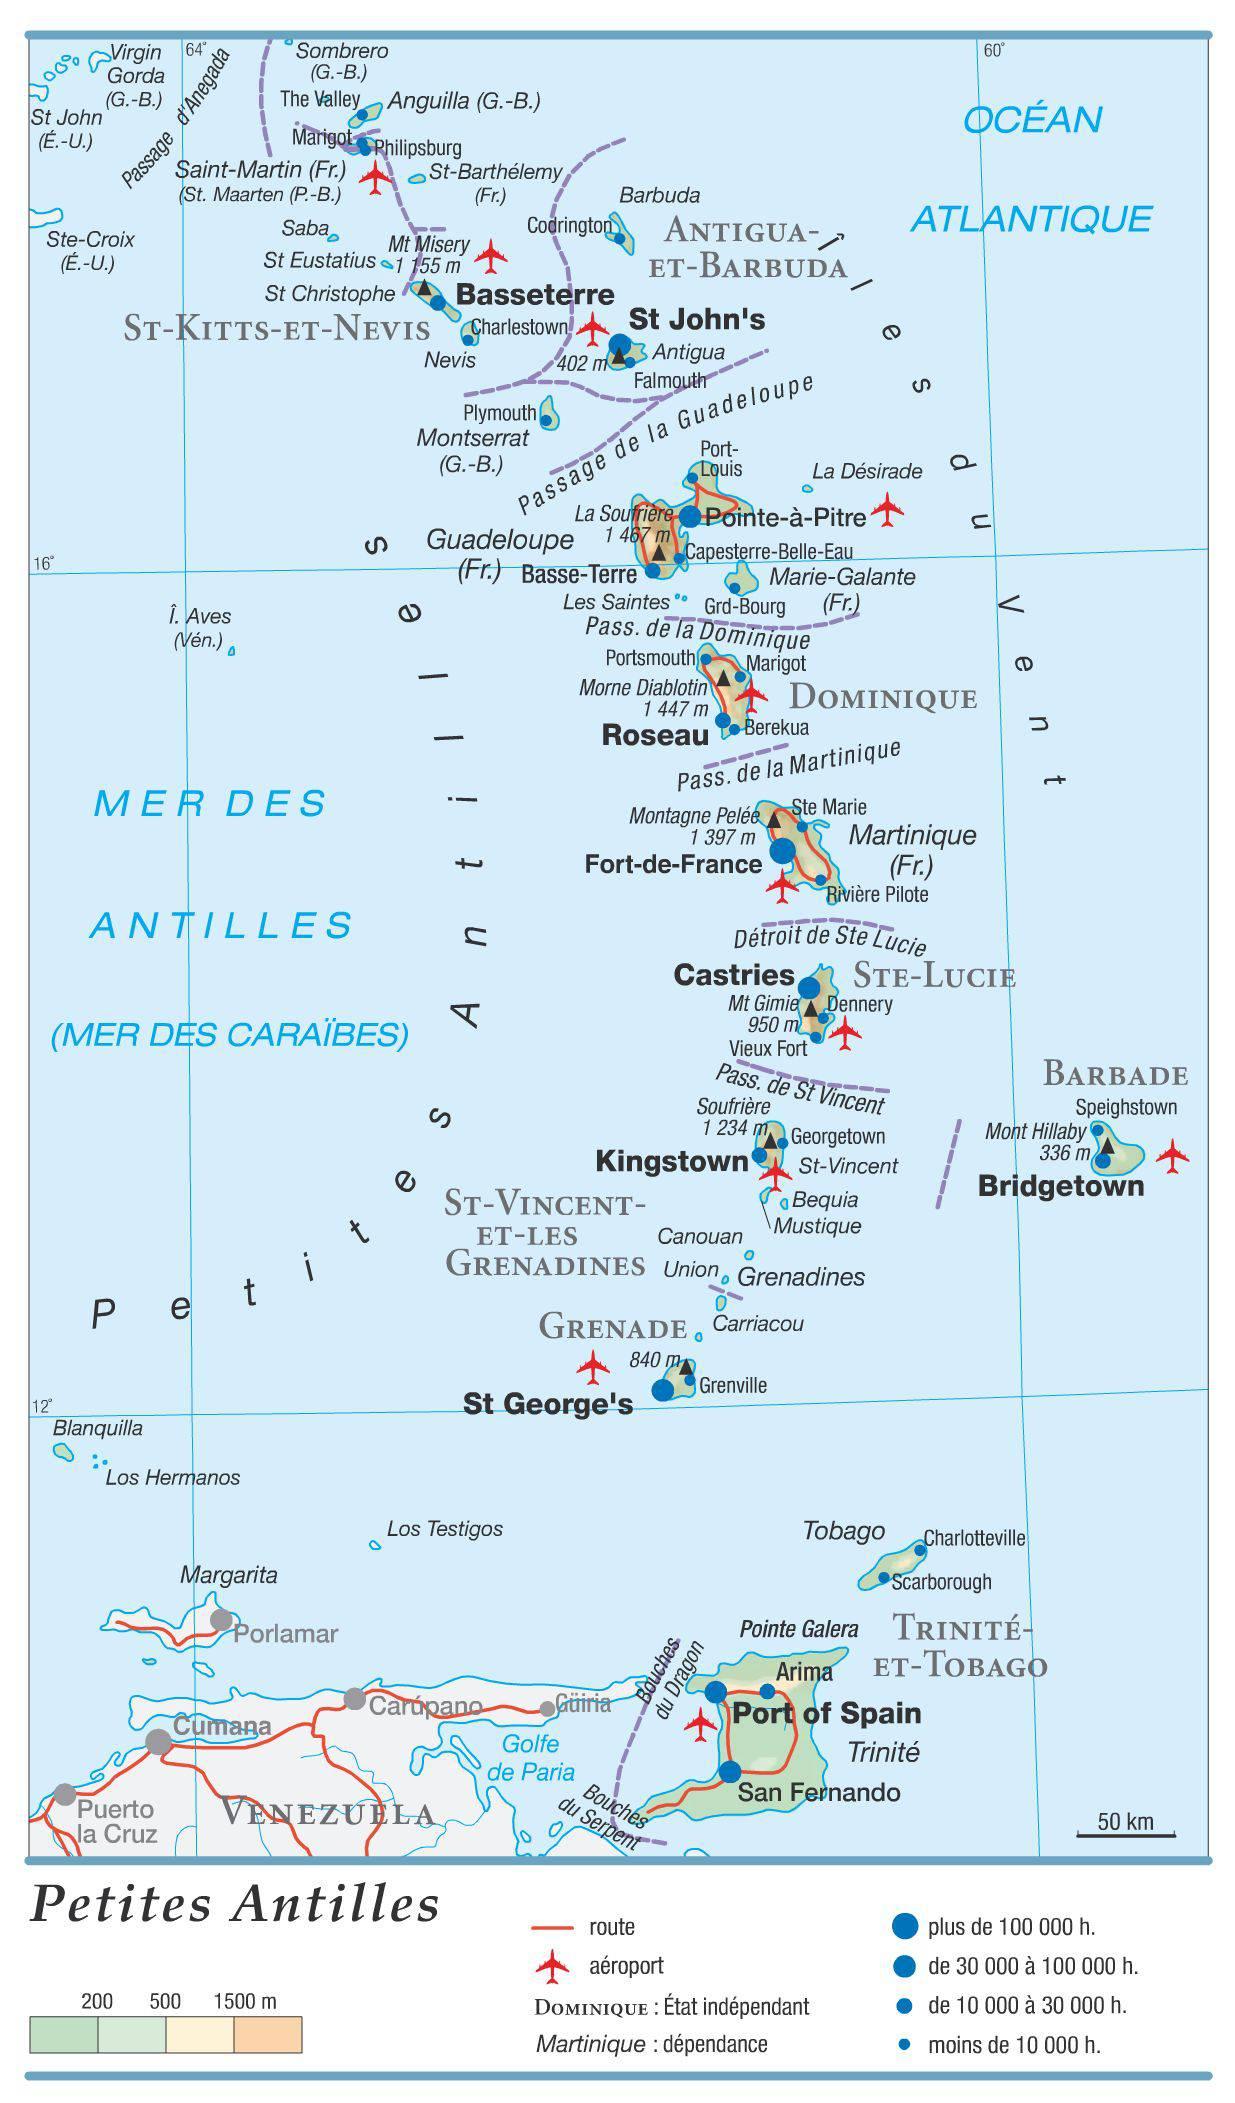 Carte géographique de la Grenade